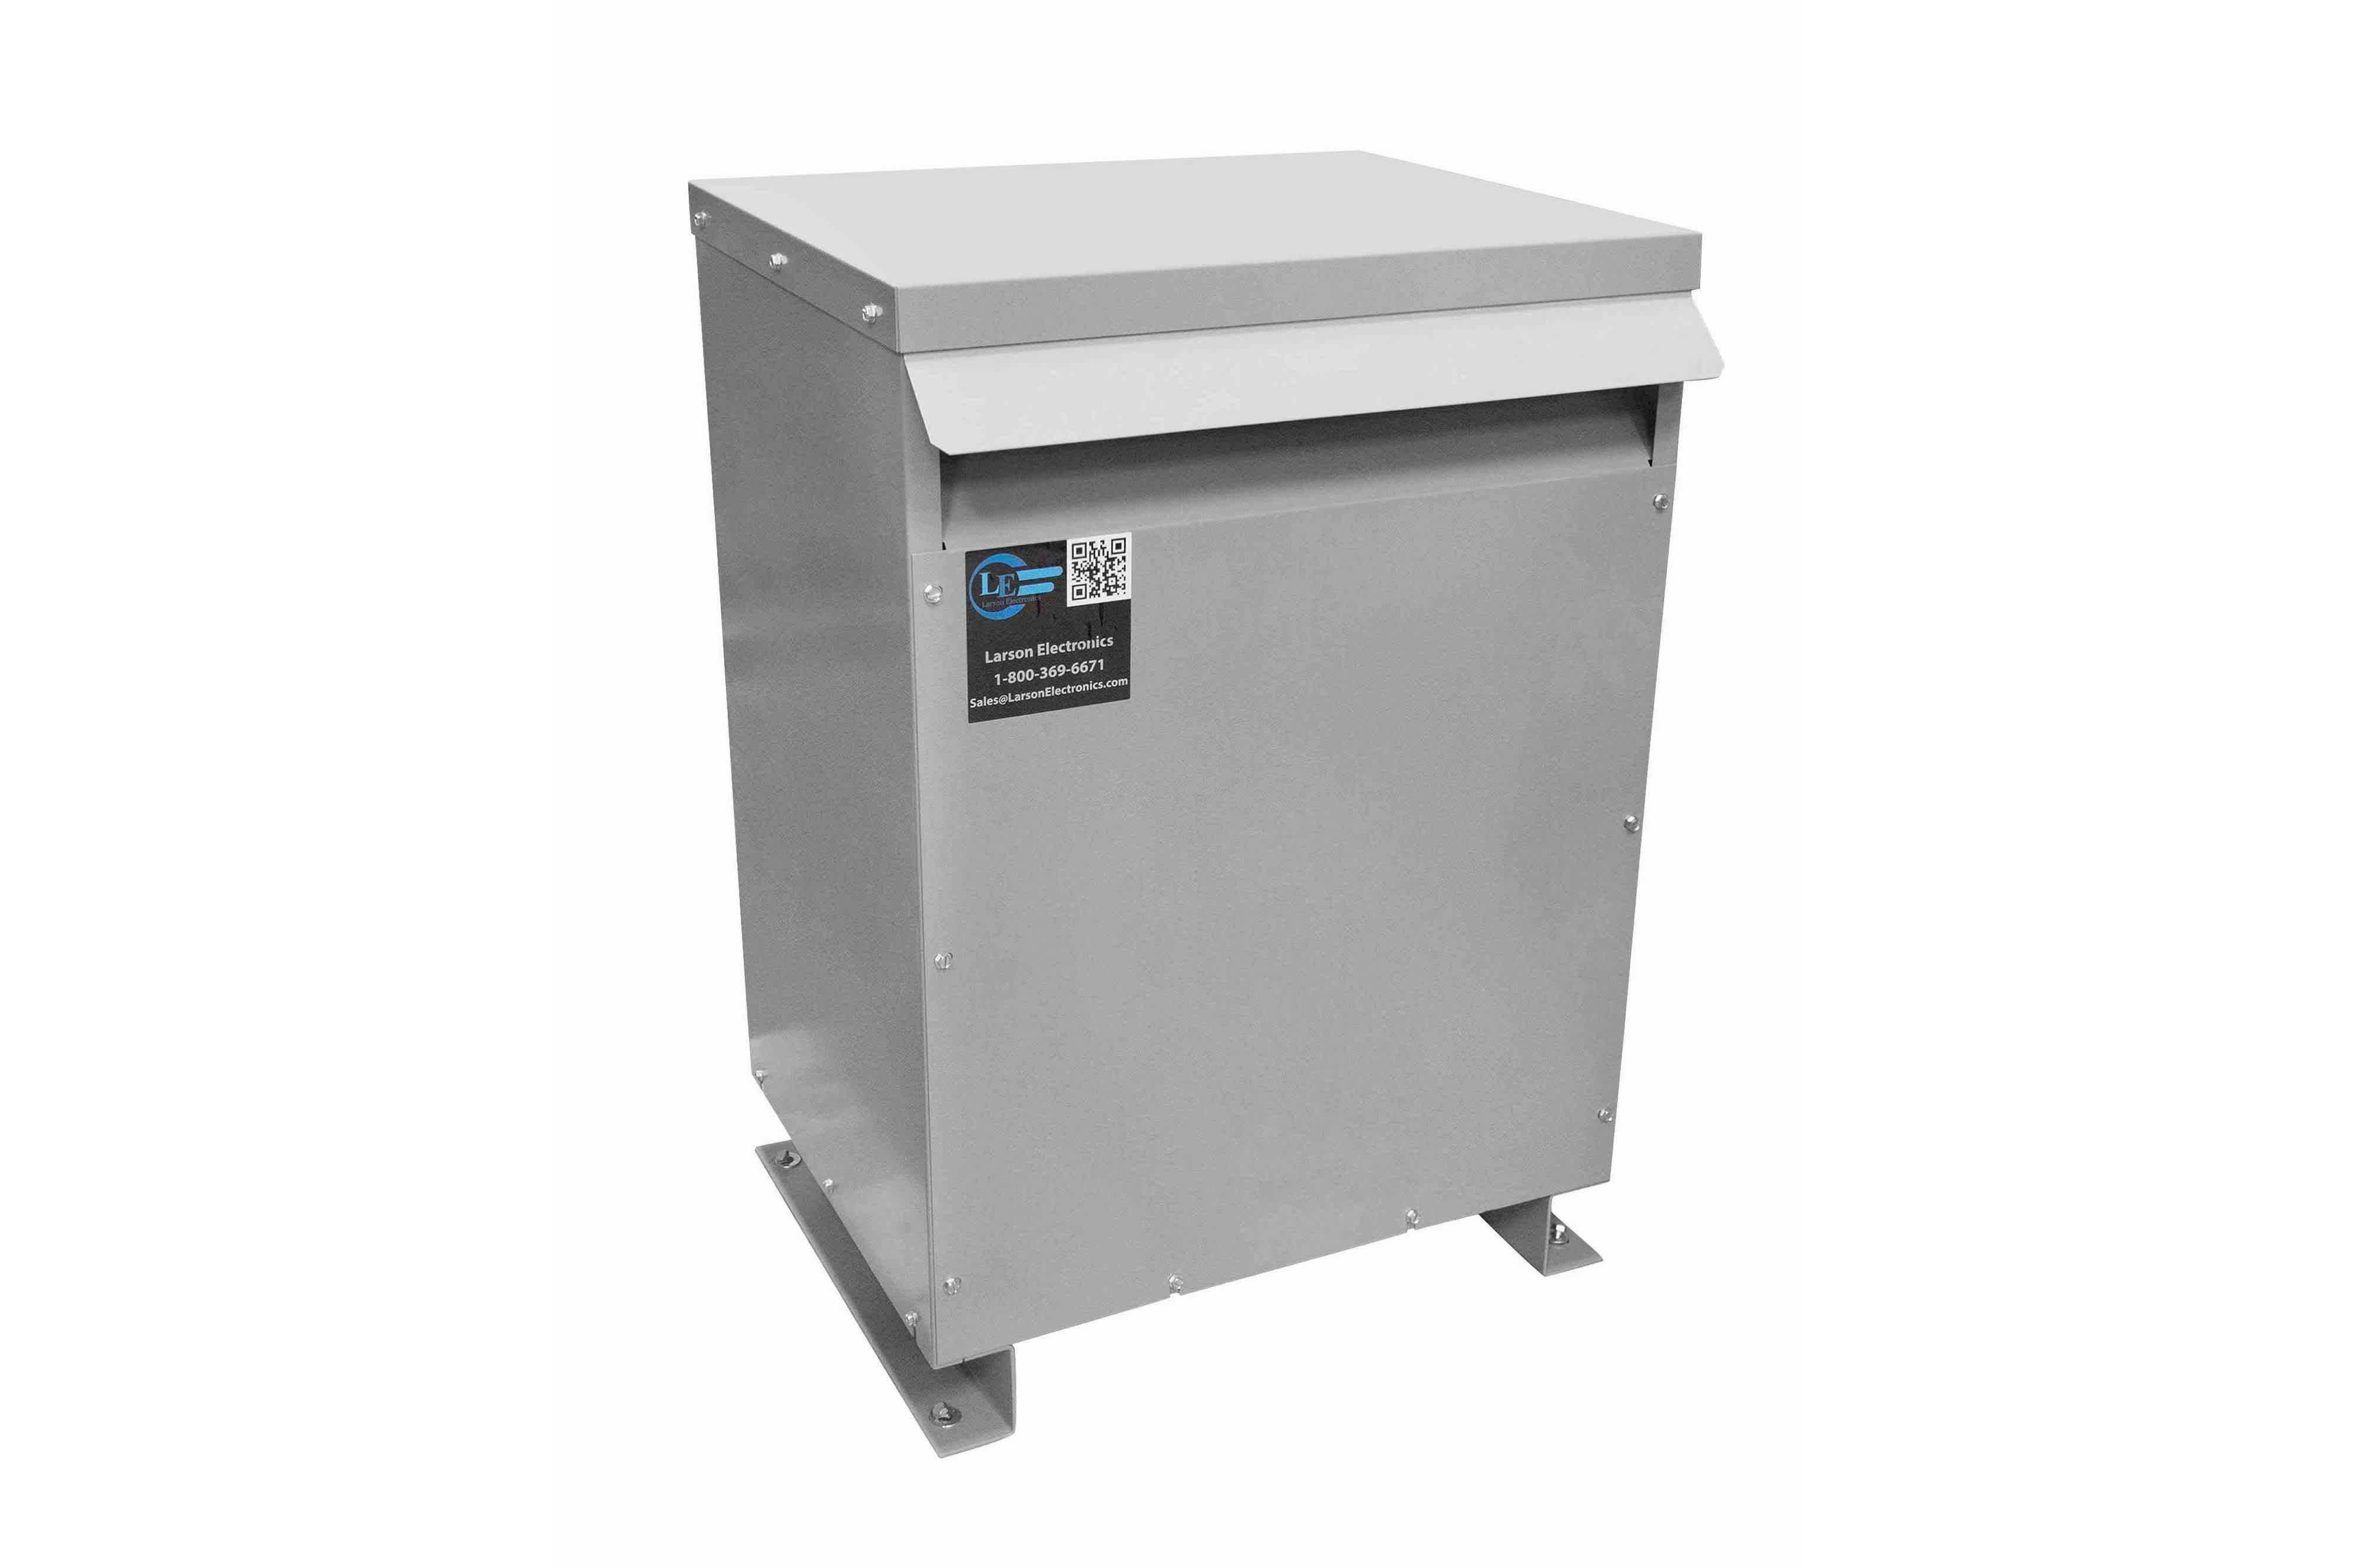 137.5 kVA 3PH Isolation Transformer, 208V Wye Primary, 480V Delta Secondary, N3R, Ventilated, 60 Hz